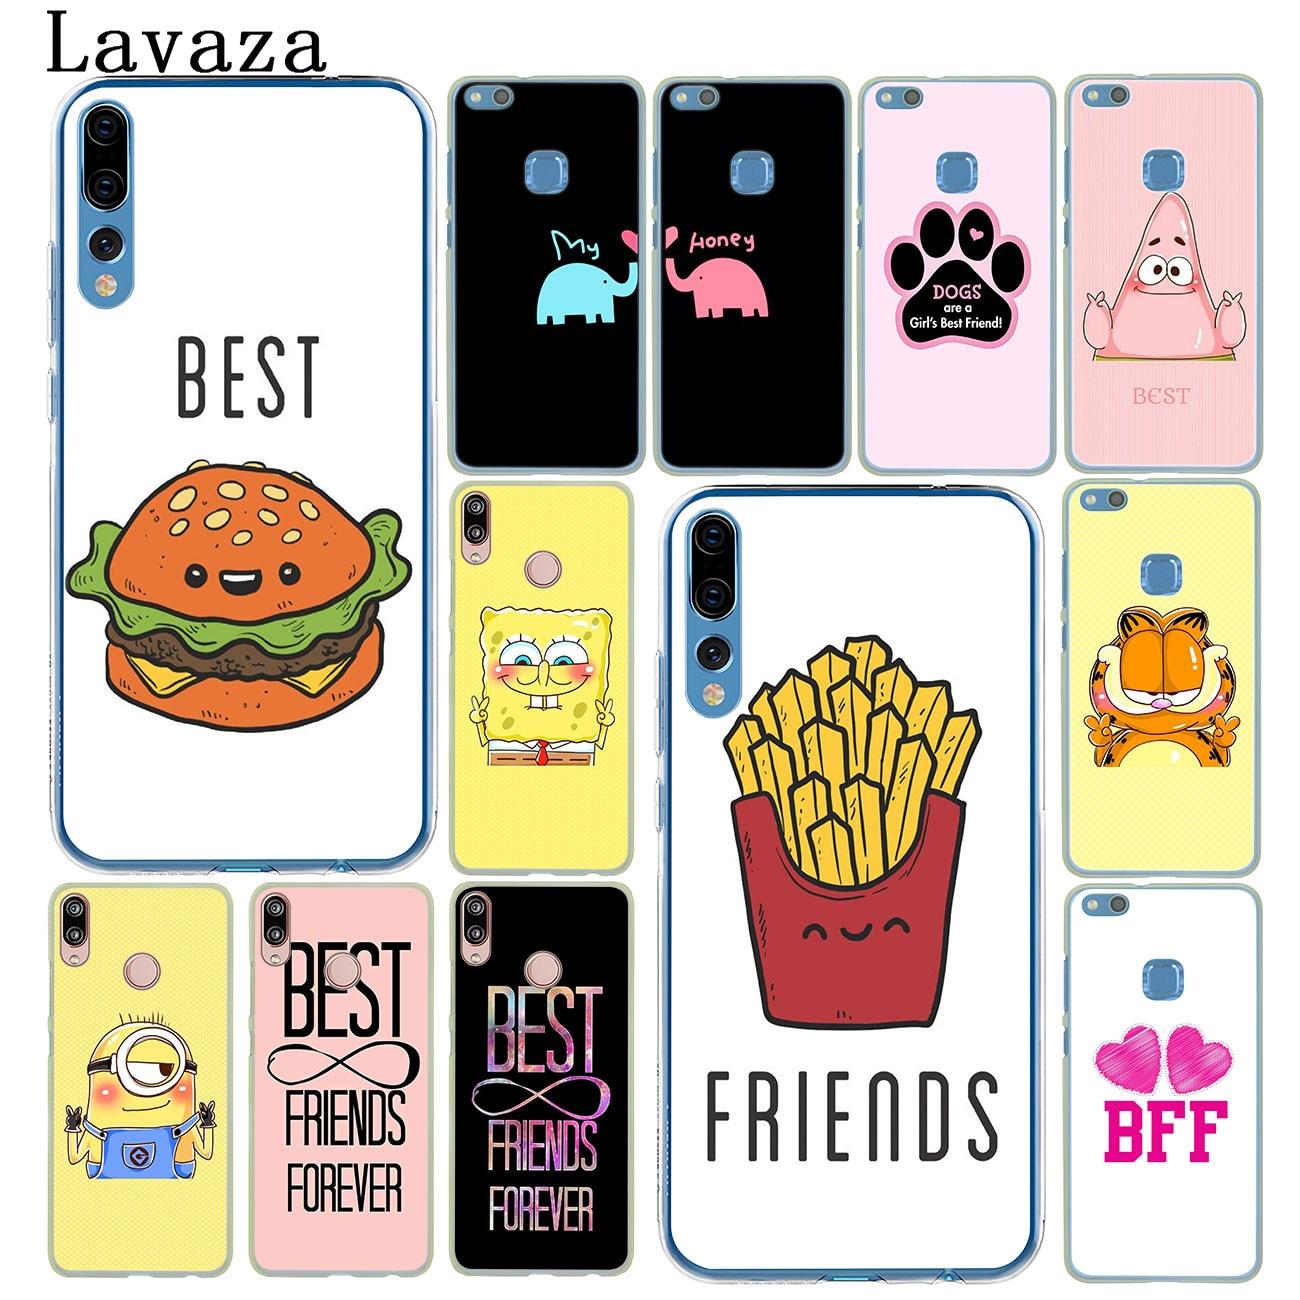 buy popular 71922 d6085 Lavaza Best Friends Girl Hard Phone Case for Huawei P20 P9 P10 Plus P8 Mate  20 Pro 10 Lite Mini 2016 2017 P smart 2019 Cover